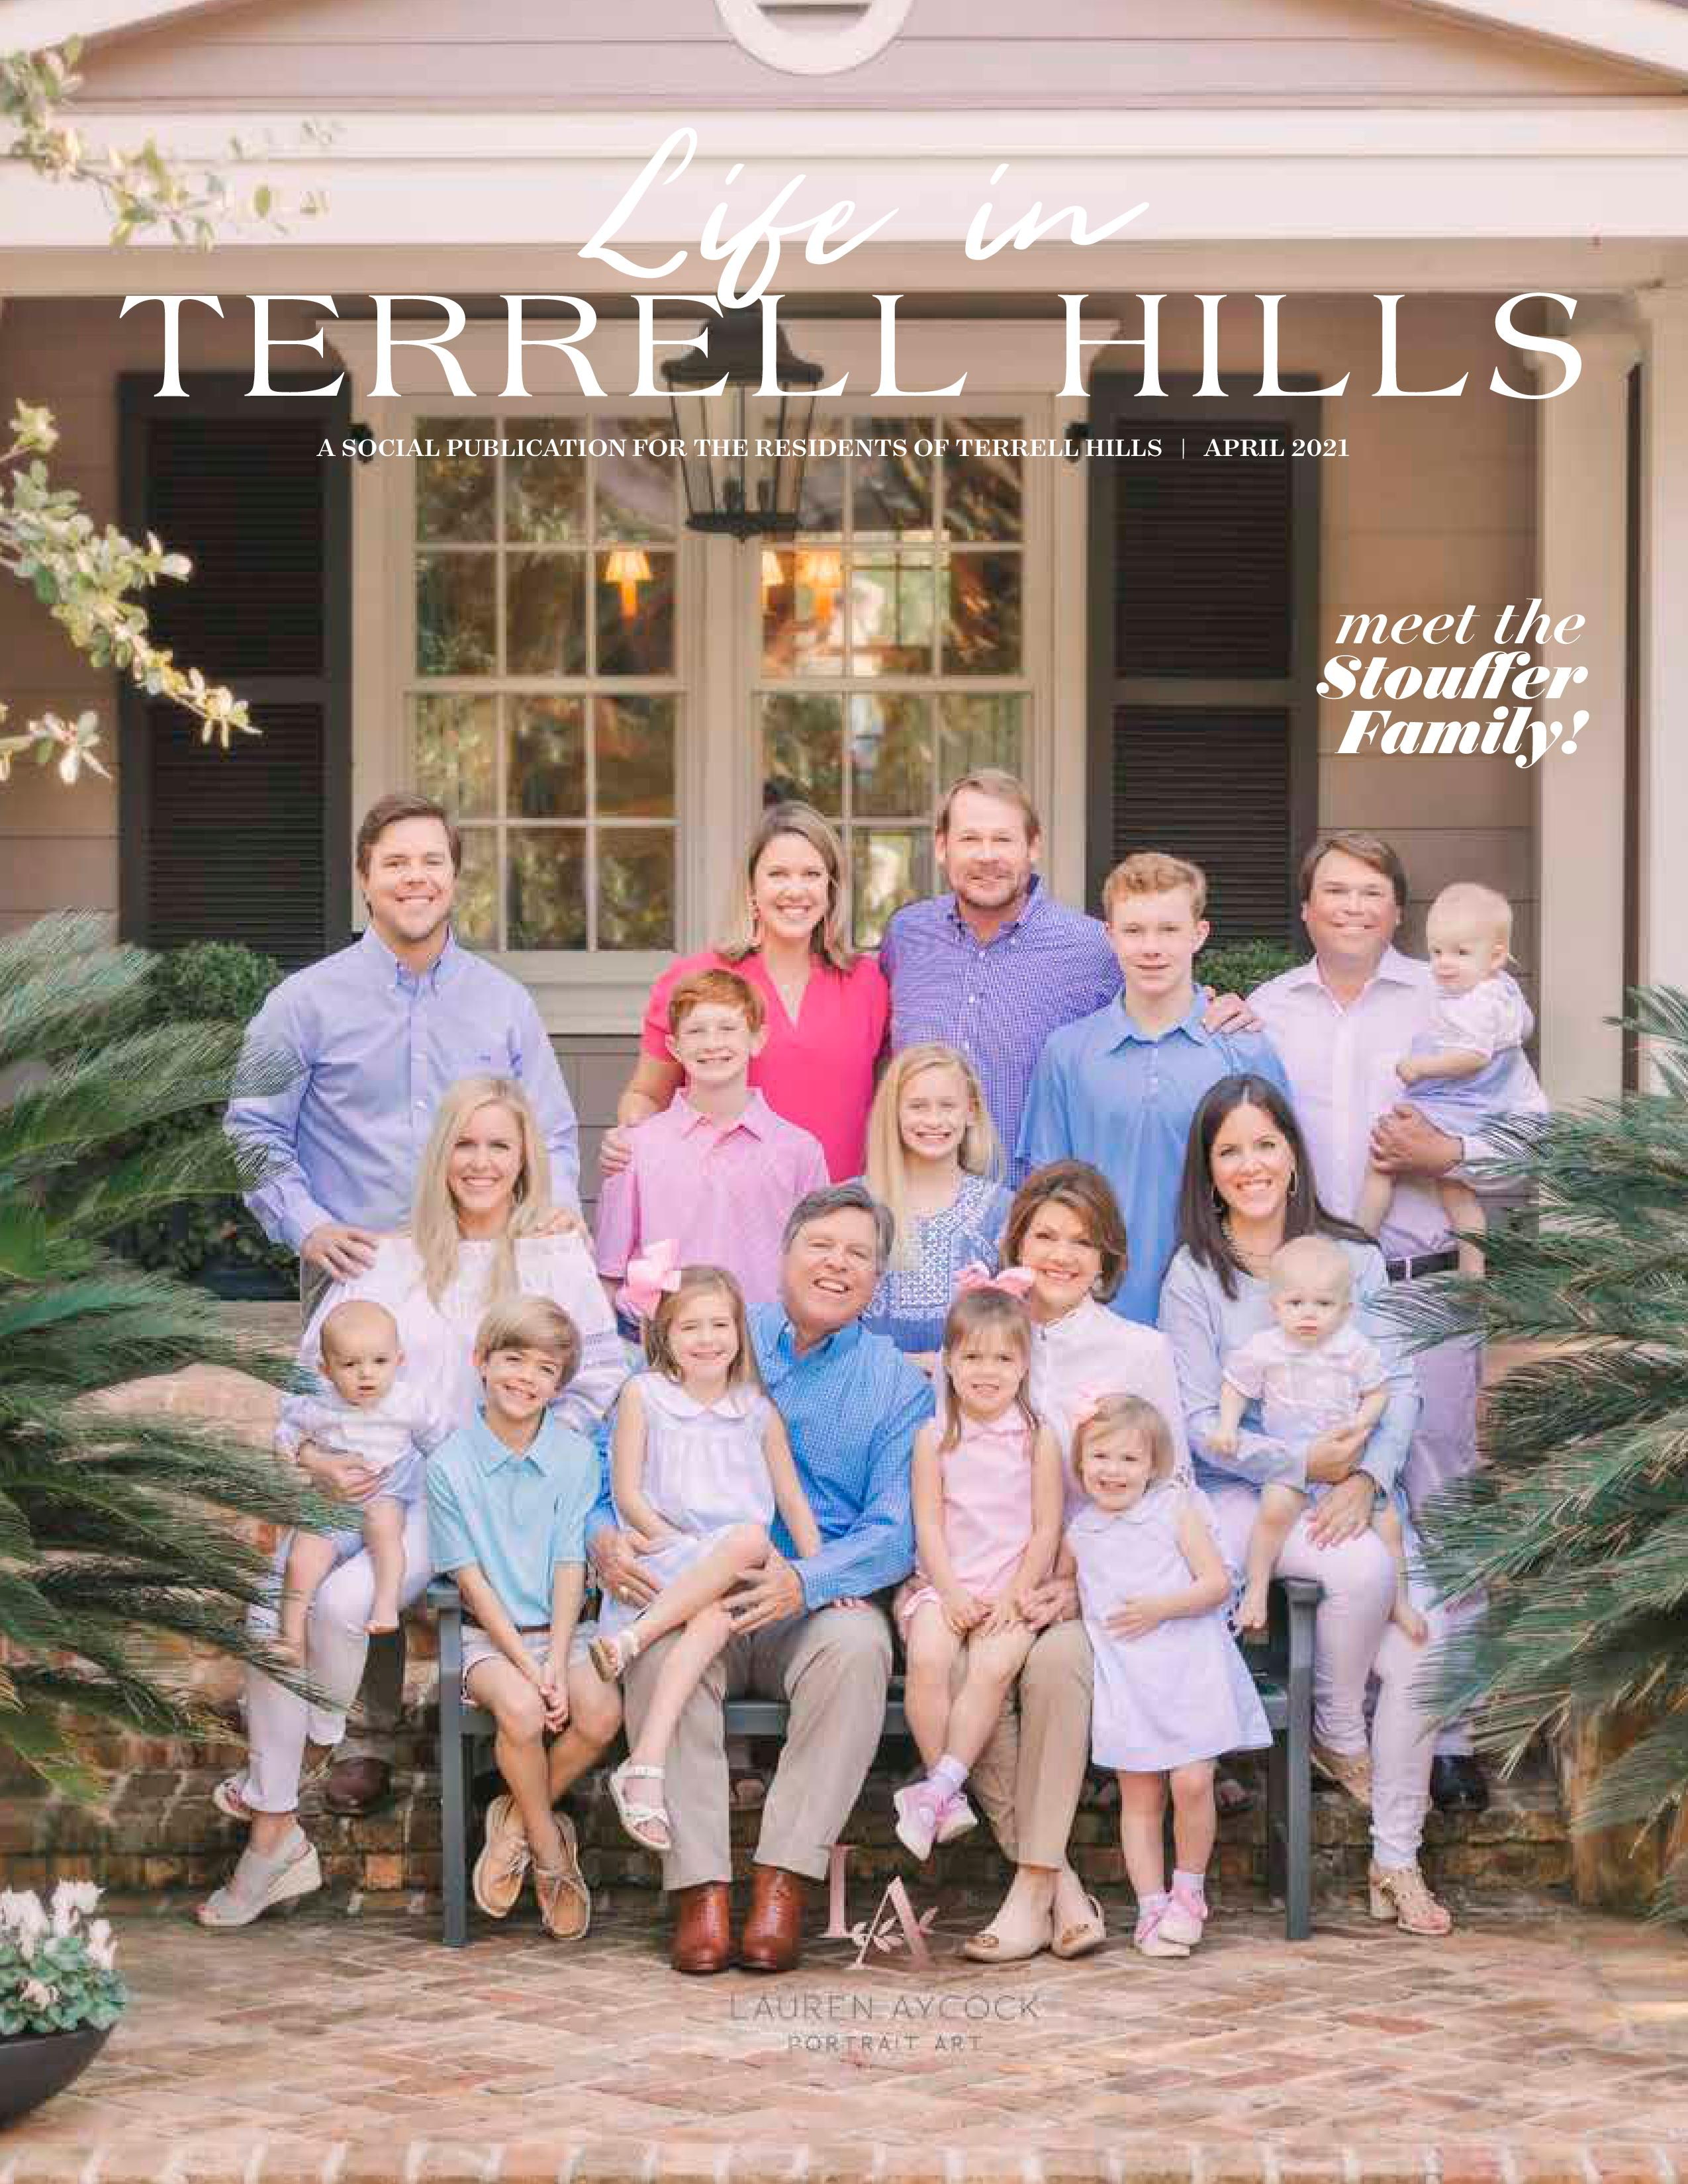 Life in Terrell Hills 2021-04-01